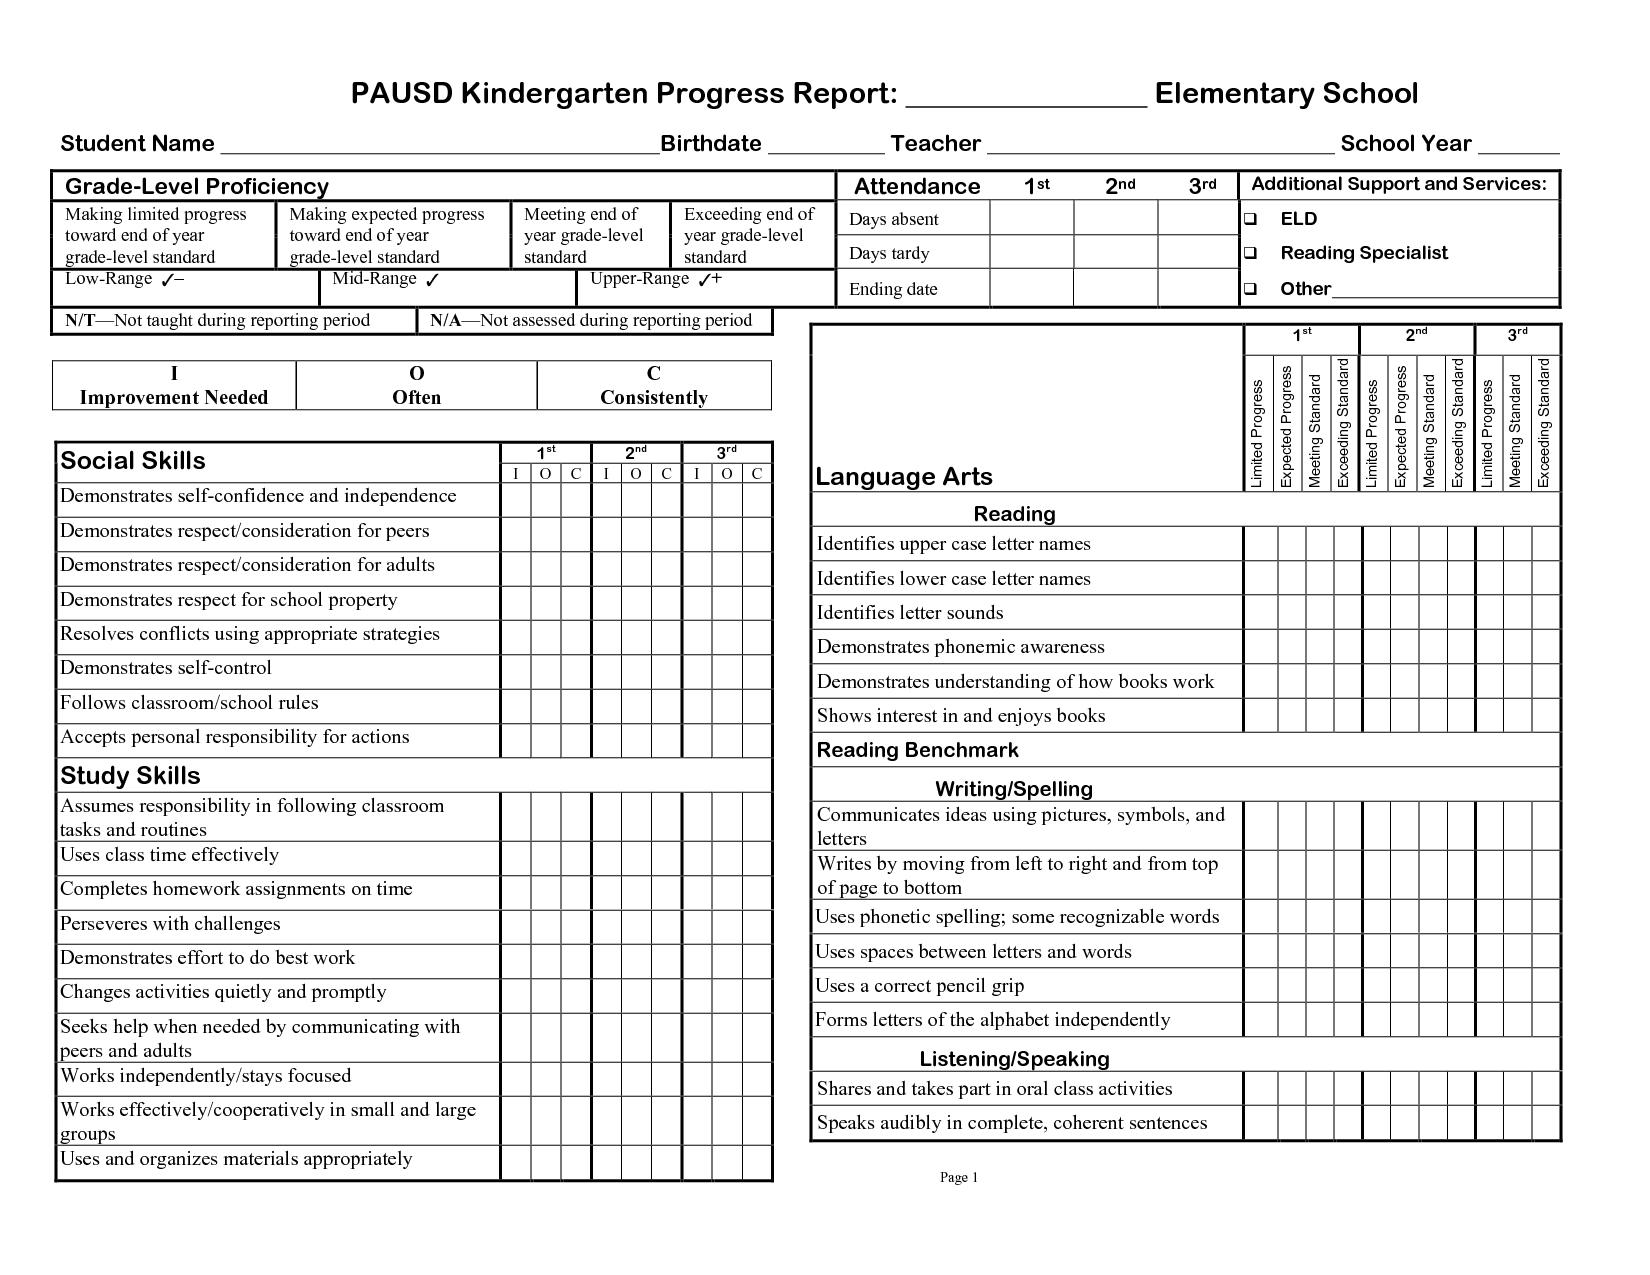 Kindergarten Social Skills Progress Report Blank Templates  Lessons With Regard To Summer School Progress Report Template